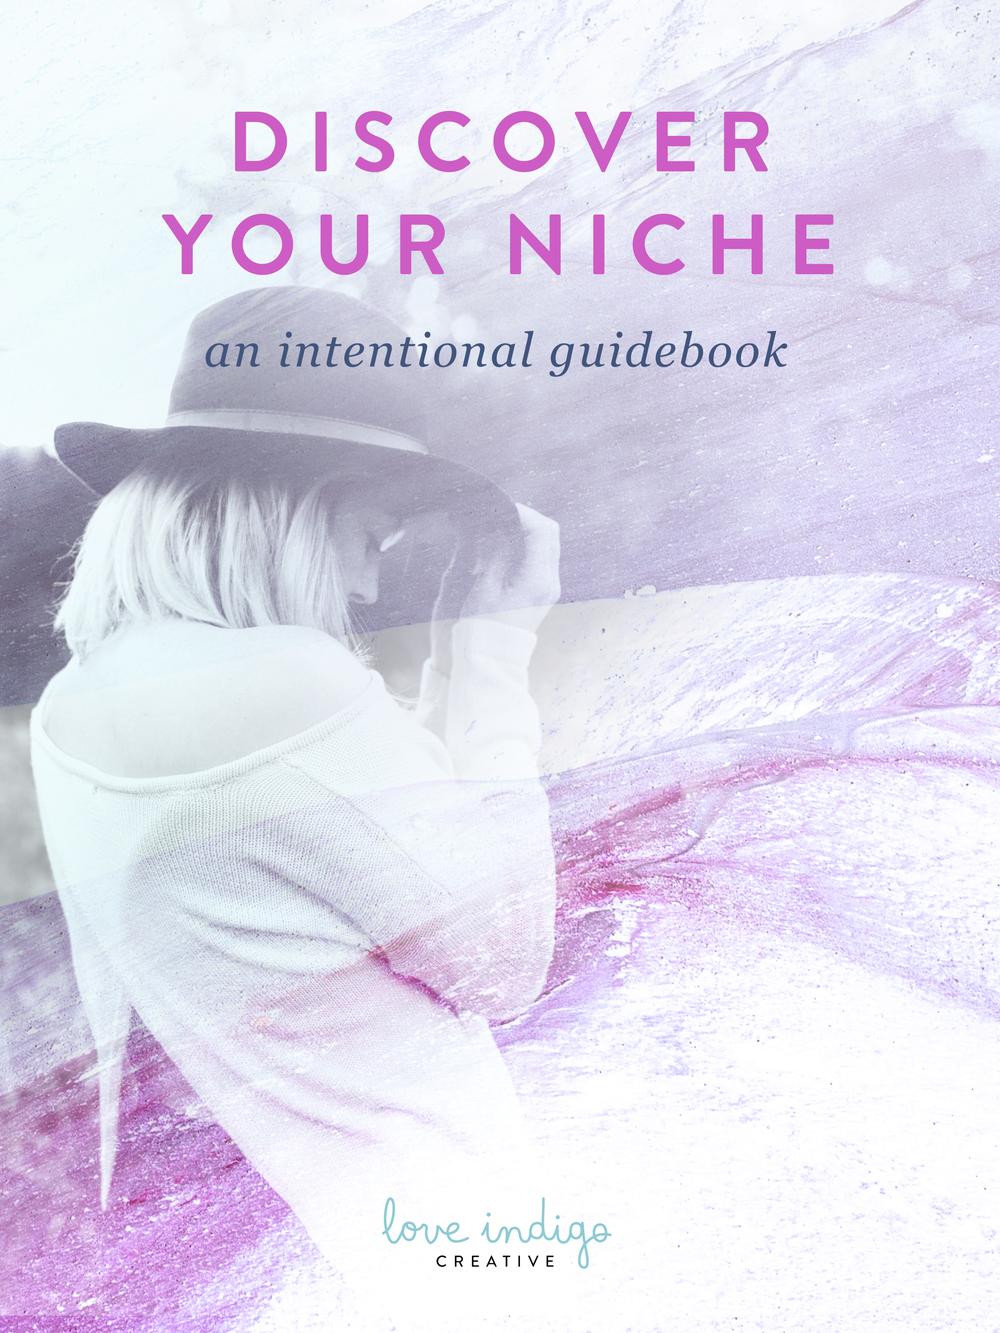 Discover Your Niche - Free eBook | Love Indigo Creative